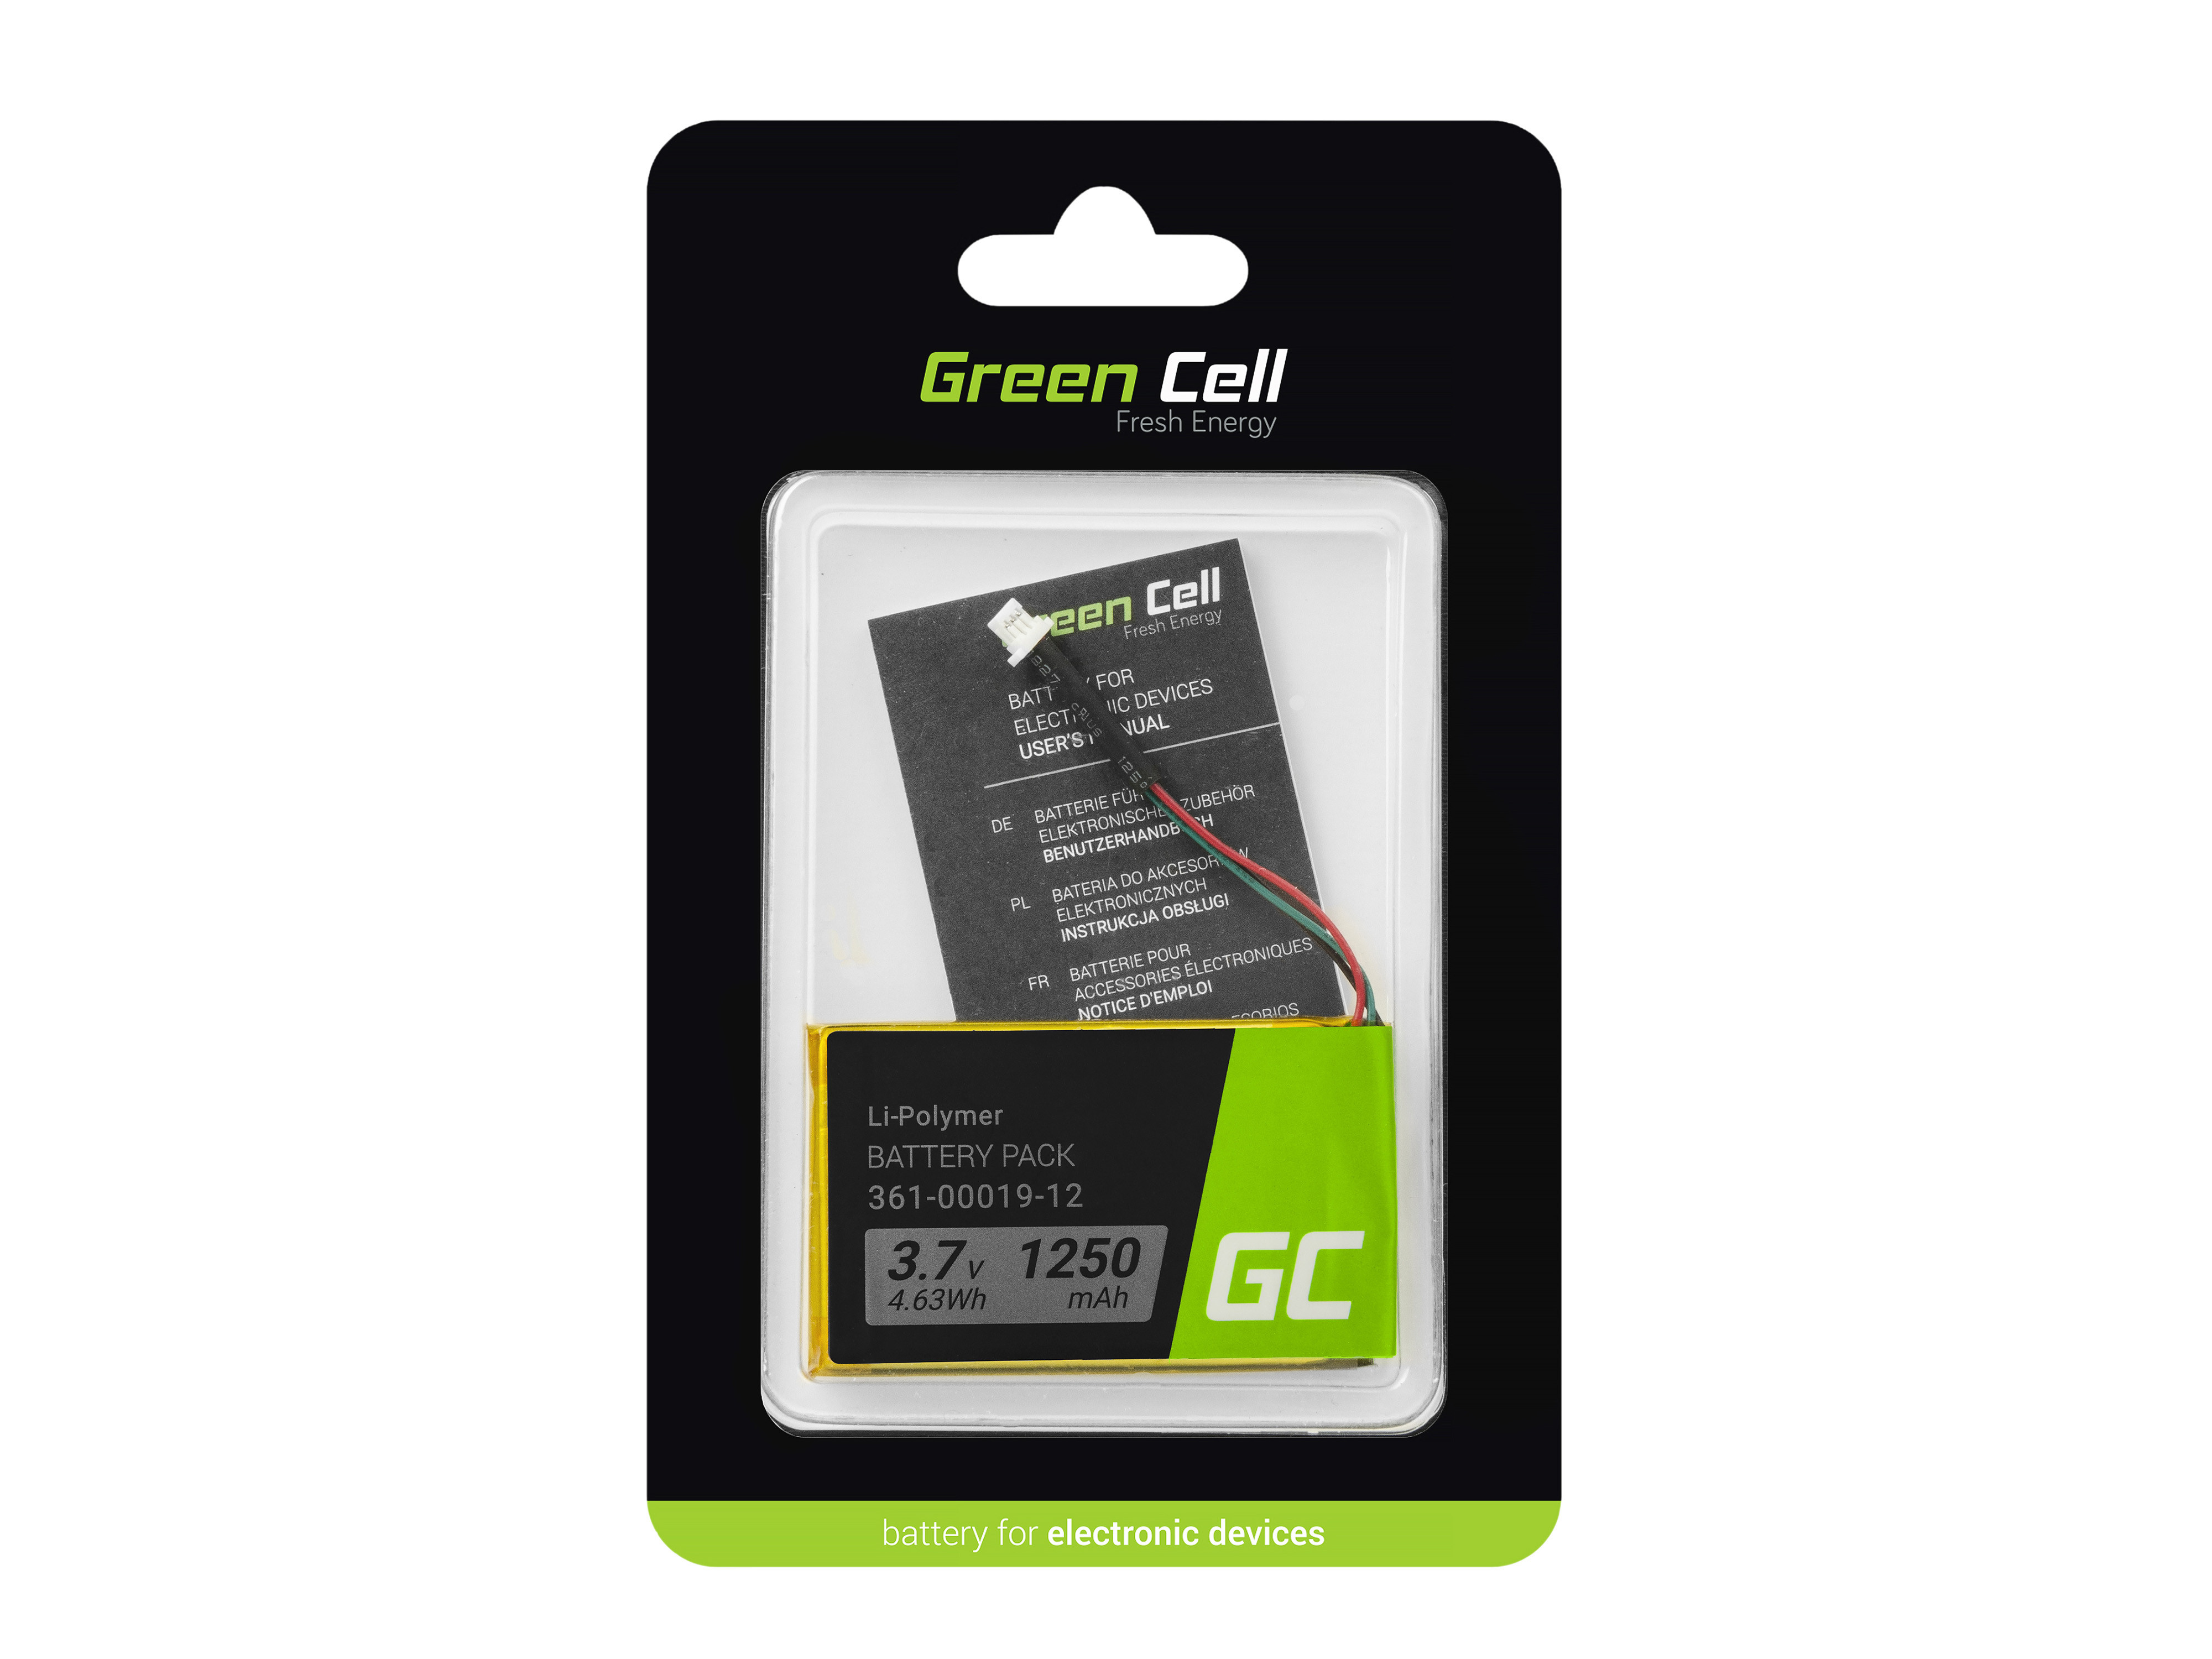 Green Cell GPS Baterie 361-00019-11 361-00019-16 Garmin Edge 605 705 Nuvi 200 285WT 710 1300 1350T